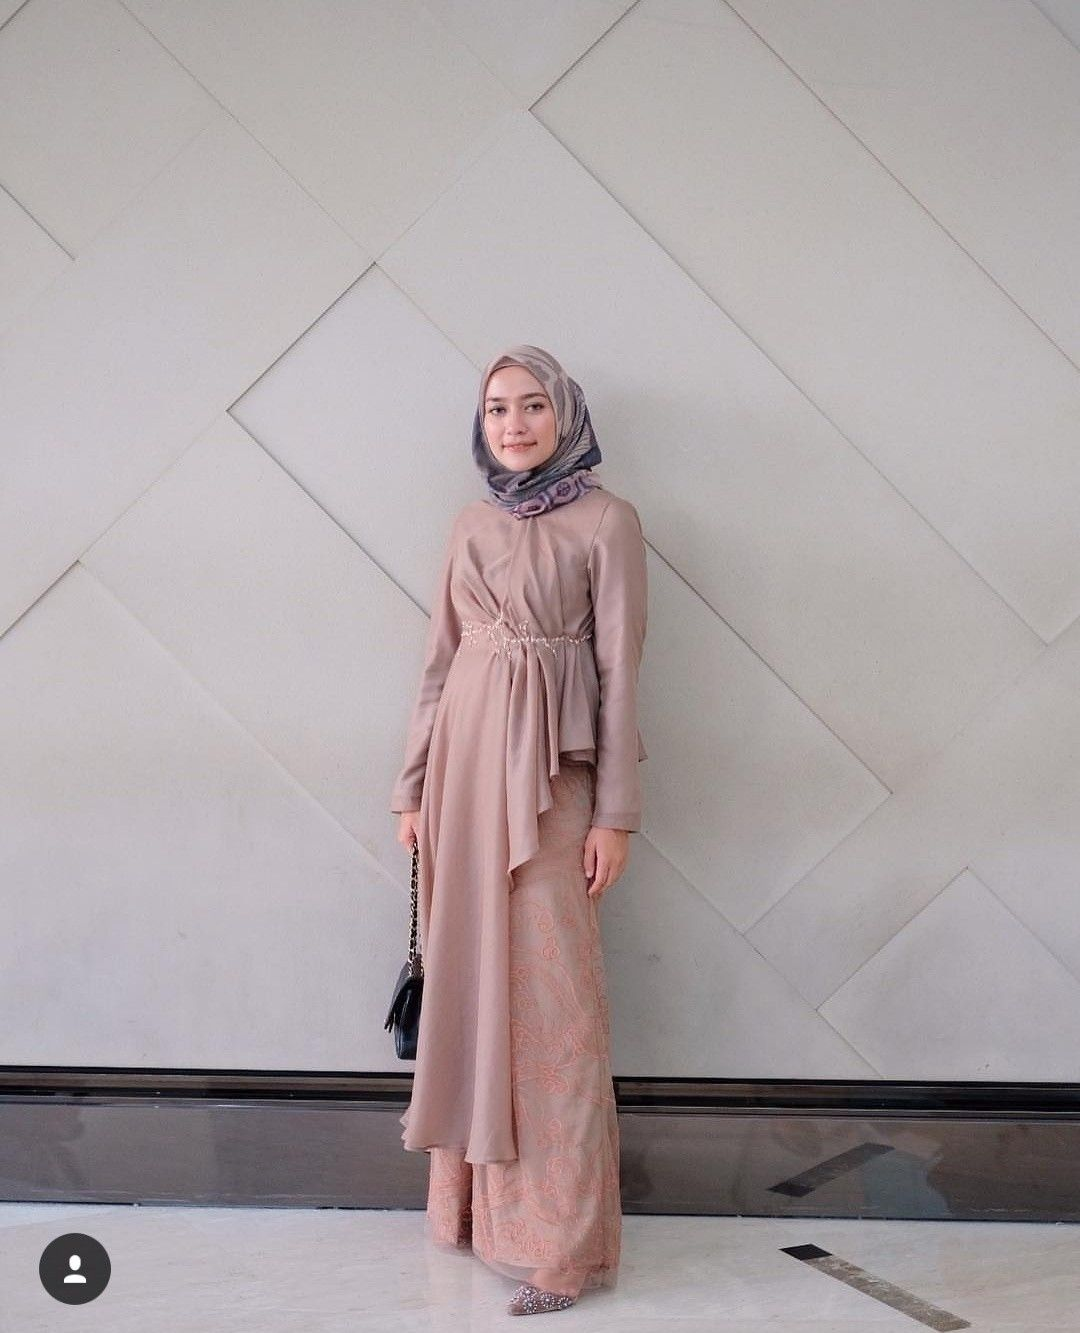 stylist idea outfit  Pakaian wanita, Pakaian pesta, Model pakaian